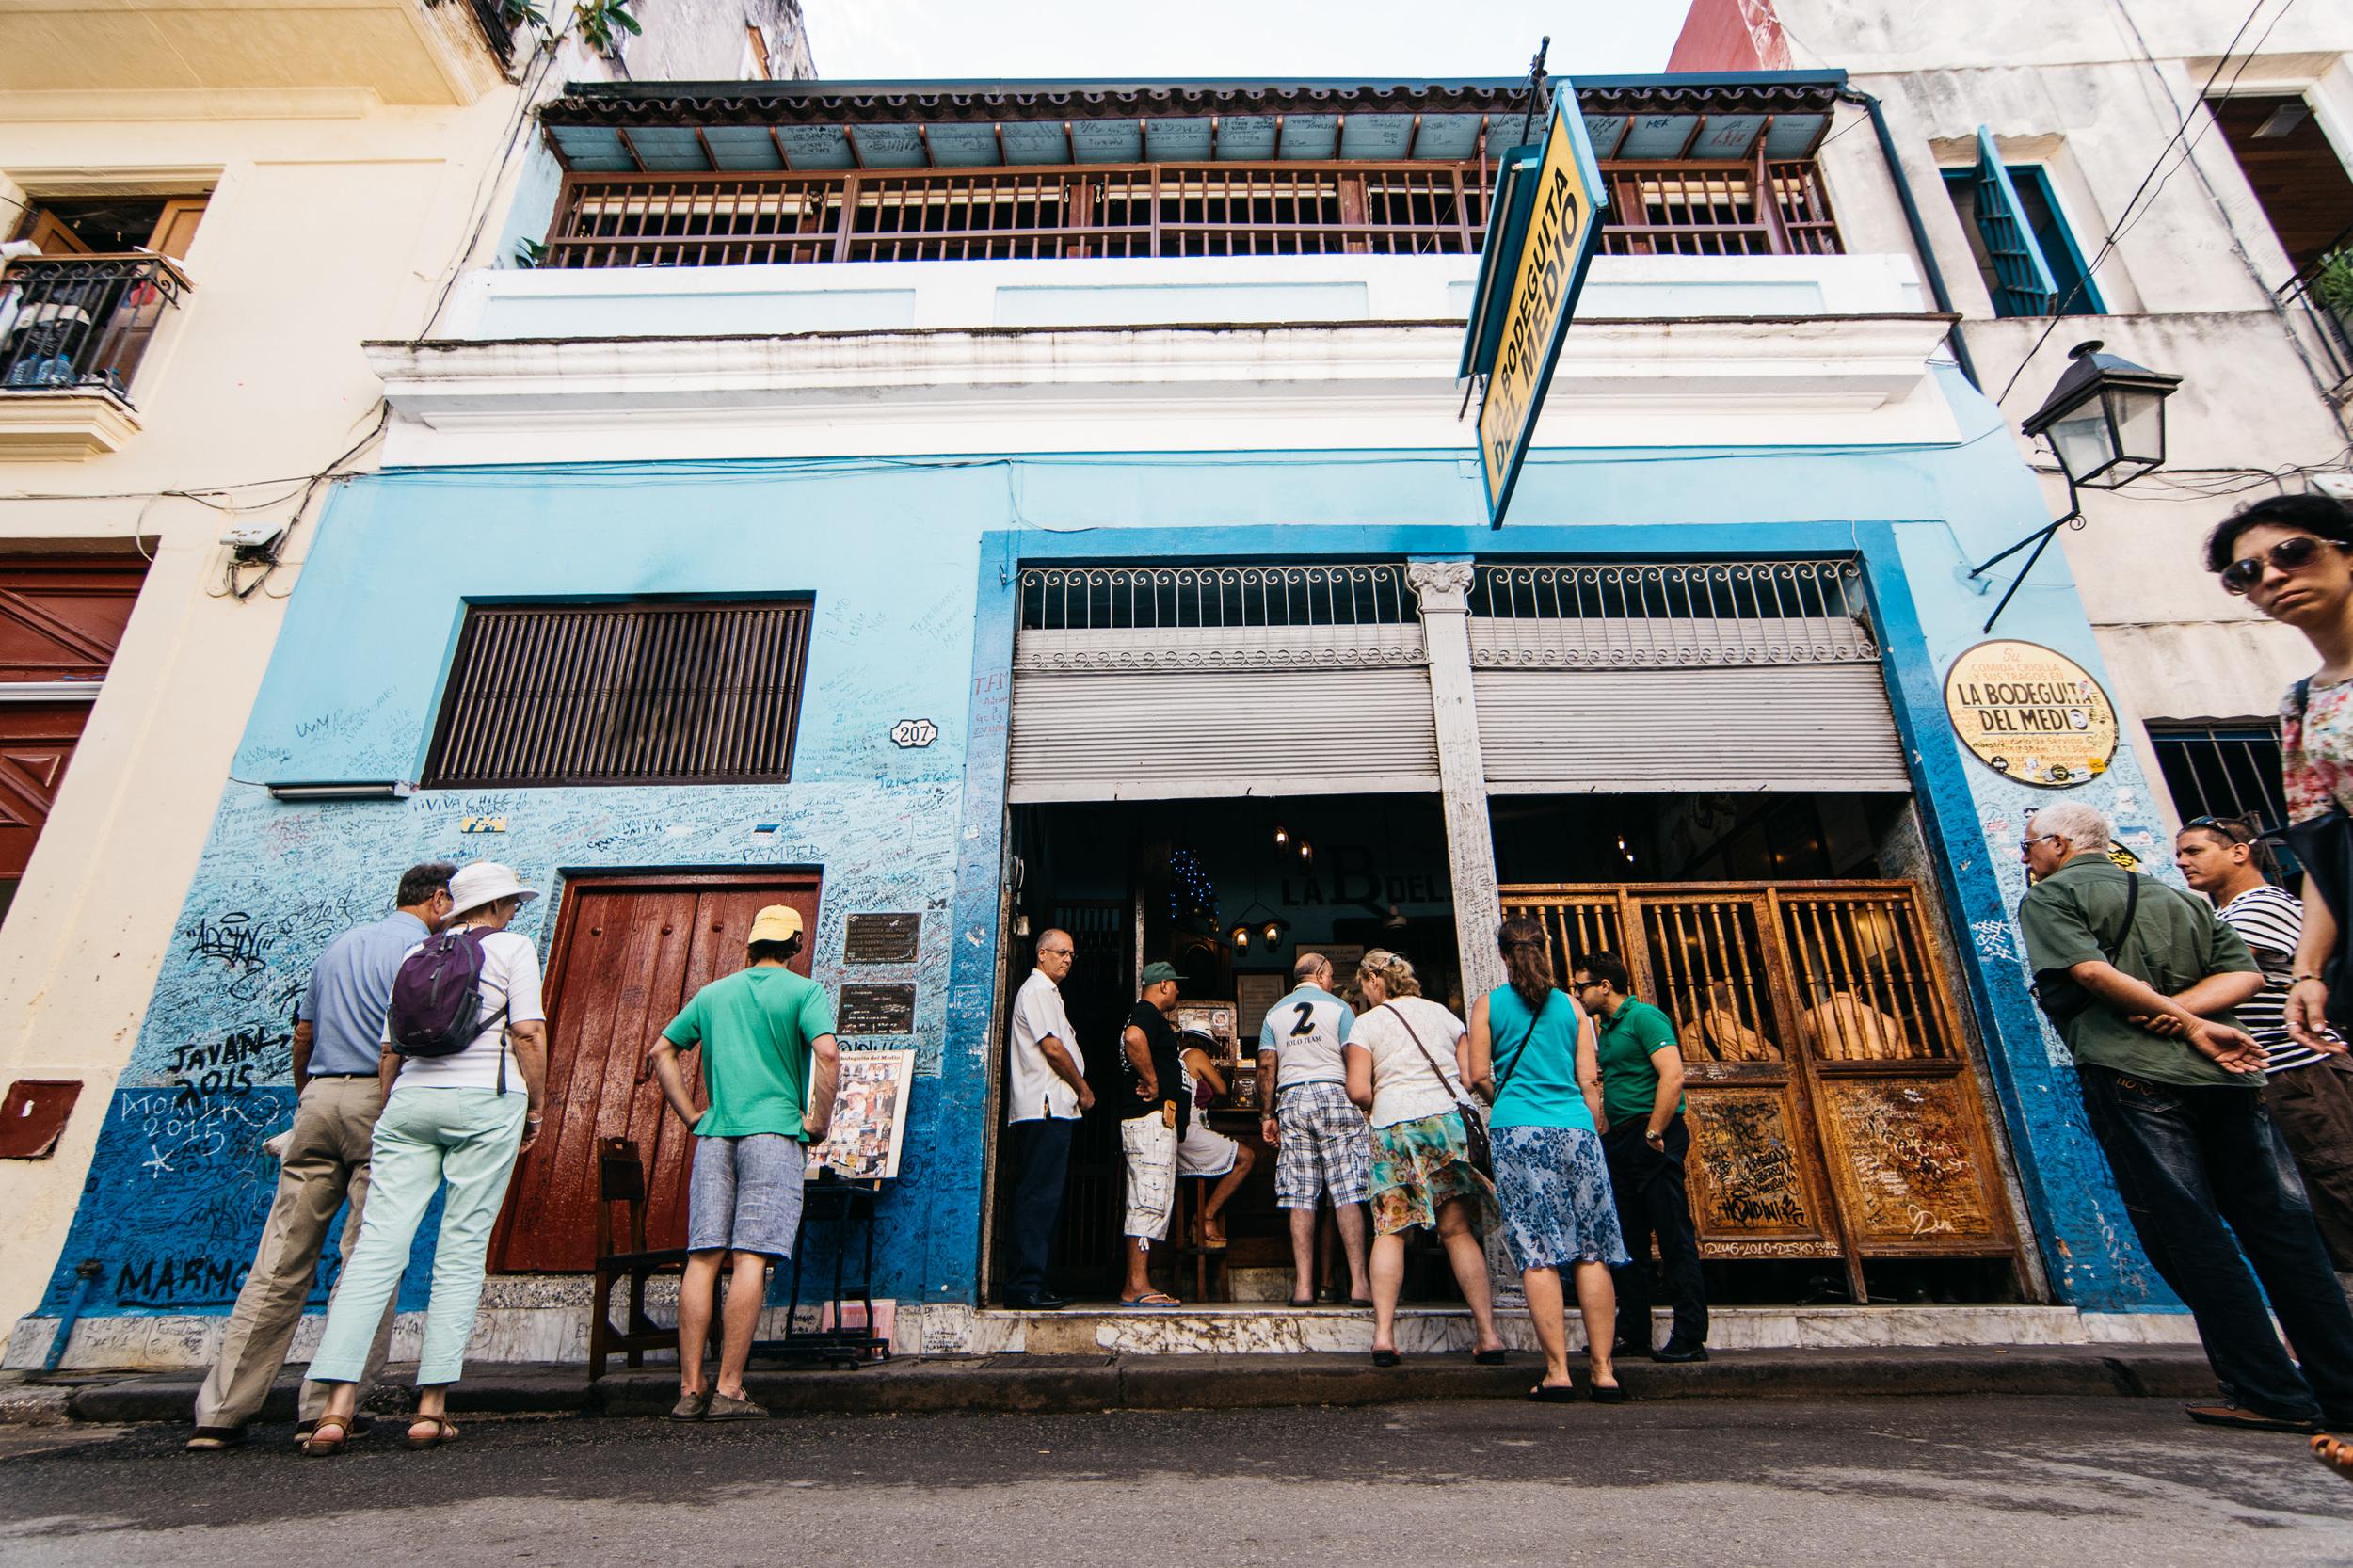 DeClaro-Photography-Cuba-02264.jpg